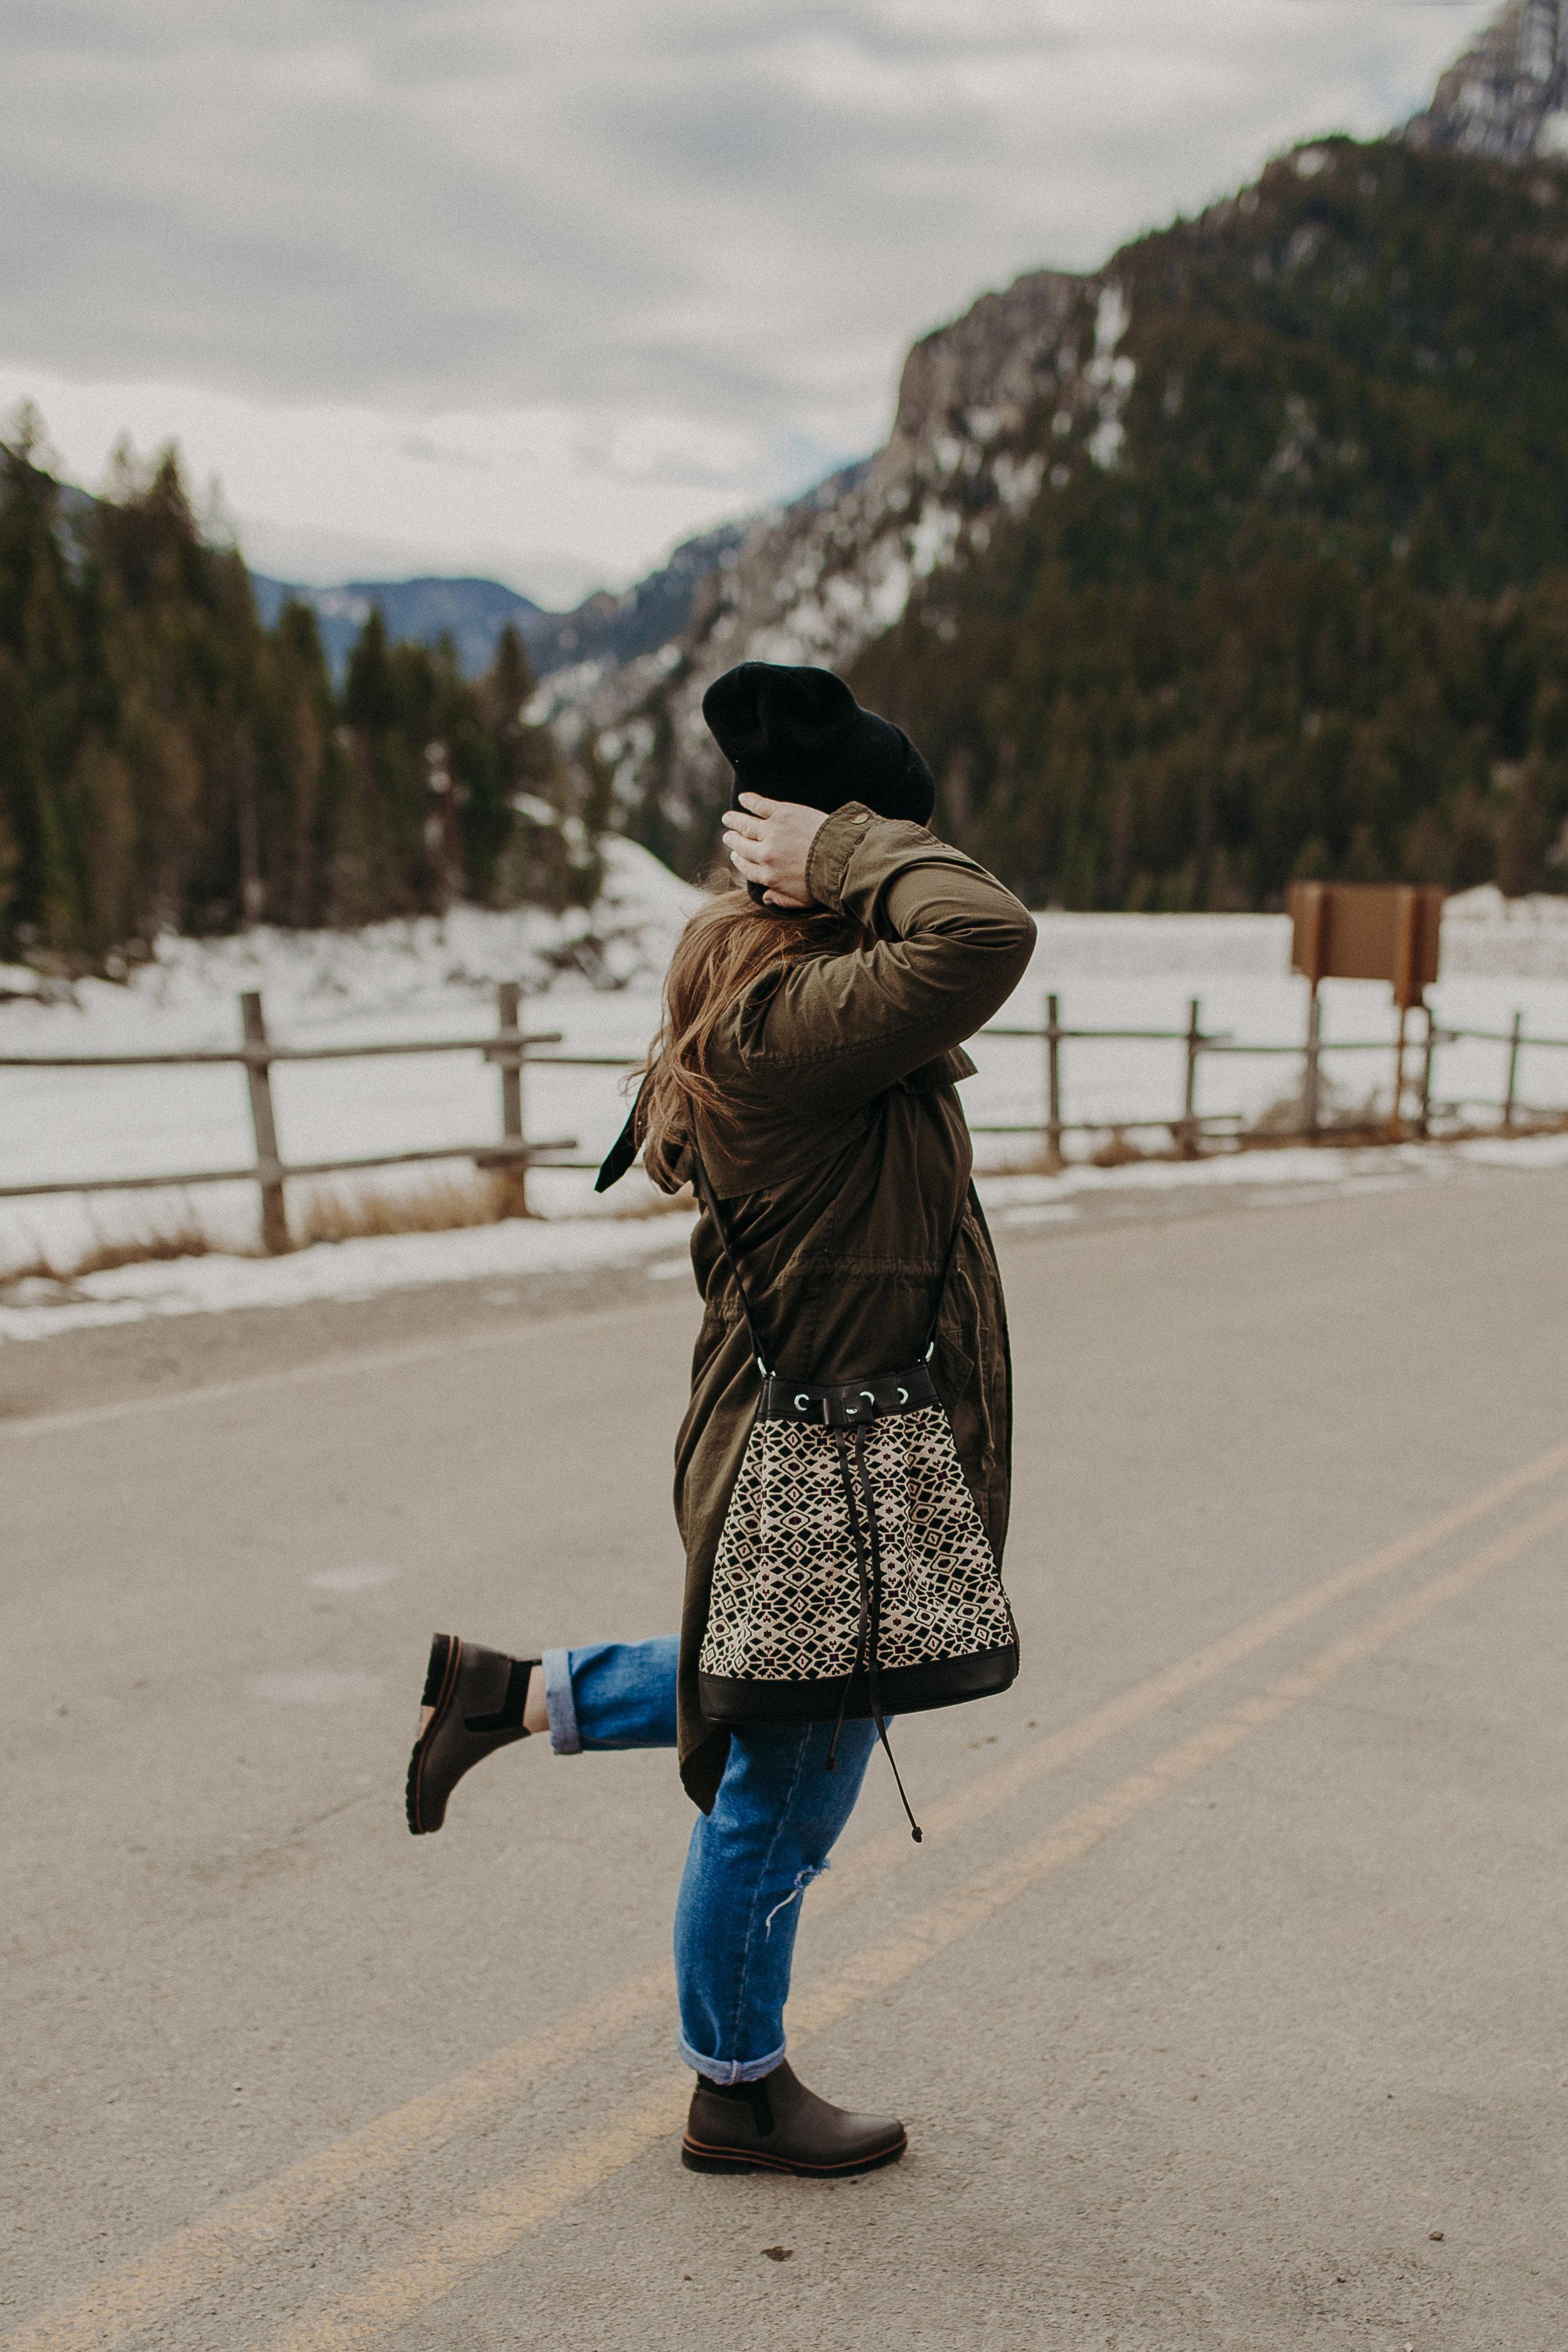 stylish-adventure-gear-and-clothing-companies-4.jpg